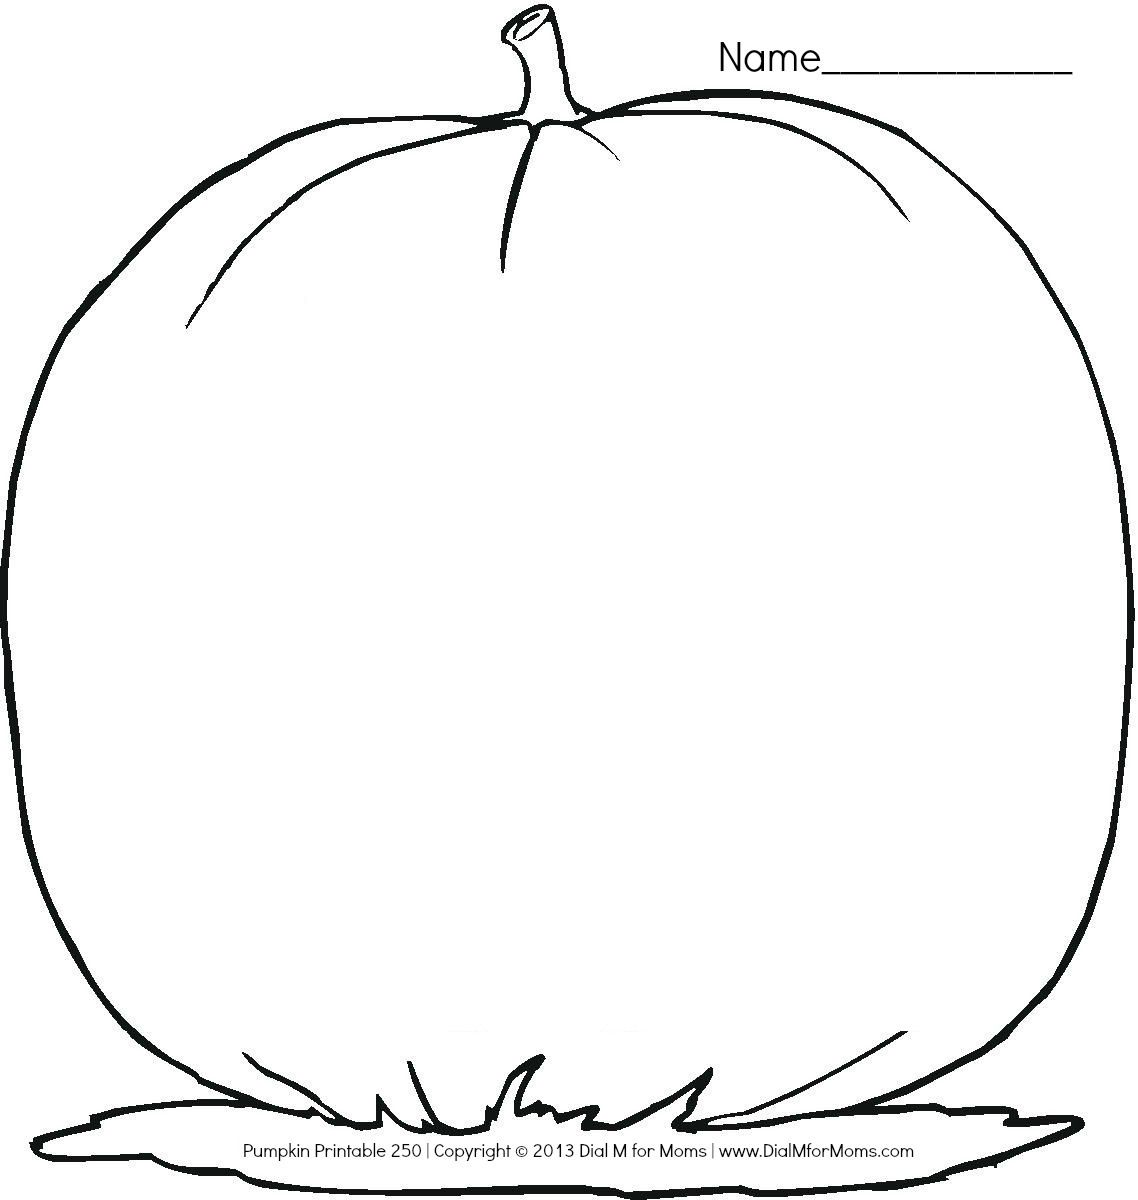 tall pumpkins clipart - Clip Art Library (1138 x 1200 Pixel)